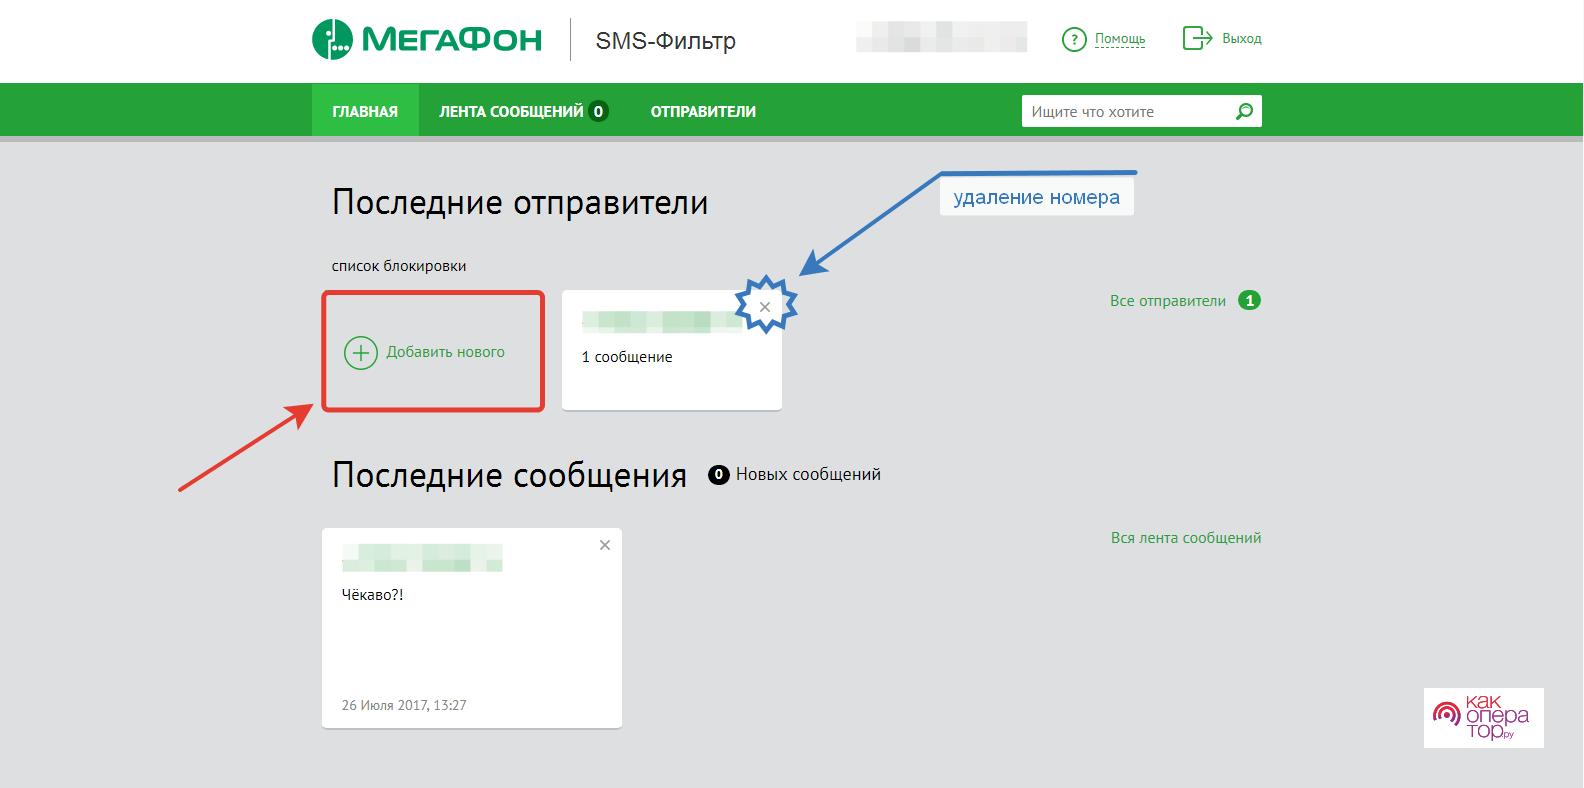 Услуга «SMS-фильтр» от МегаФон